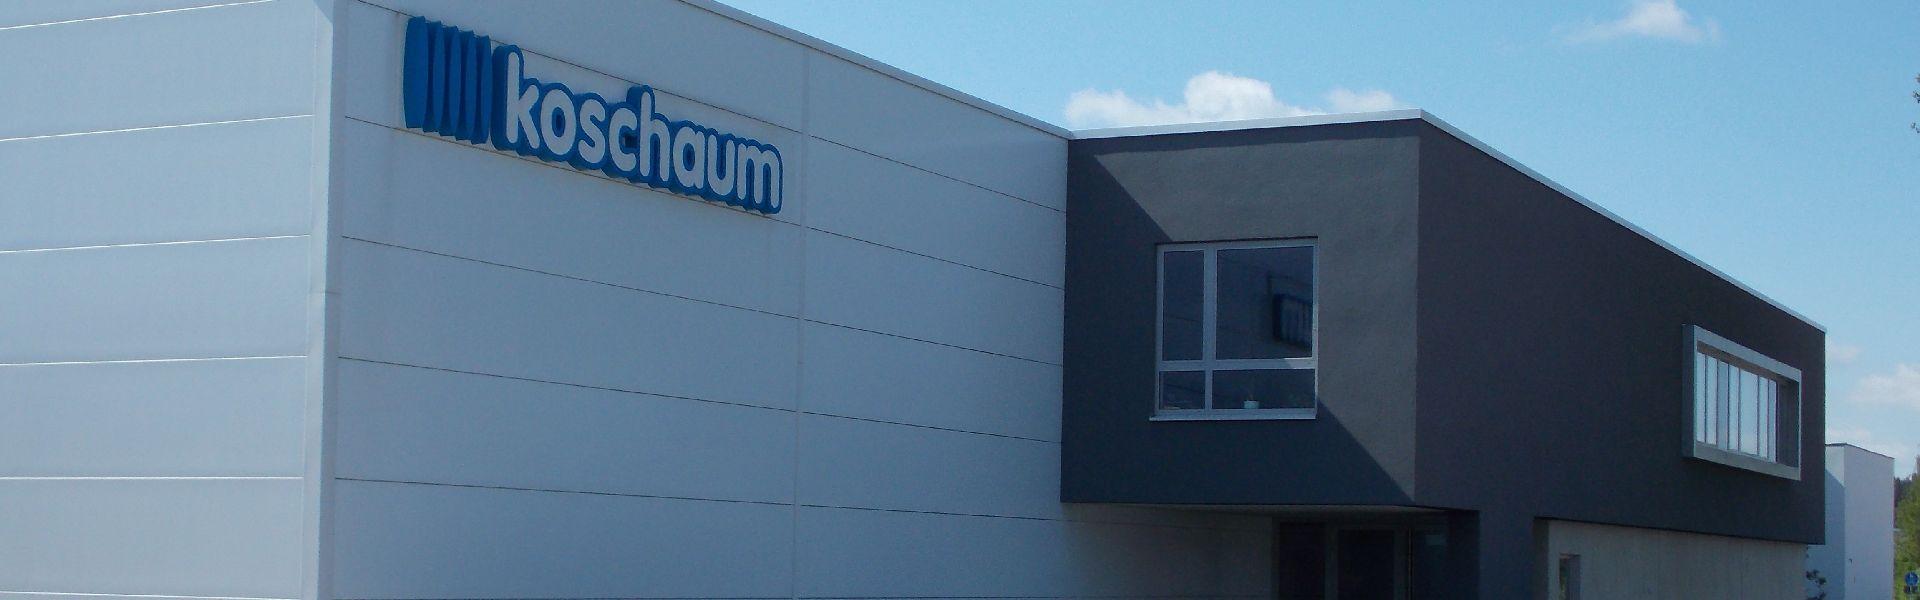 Koschaum GmbH